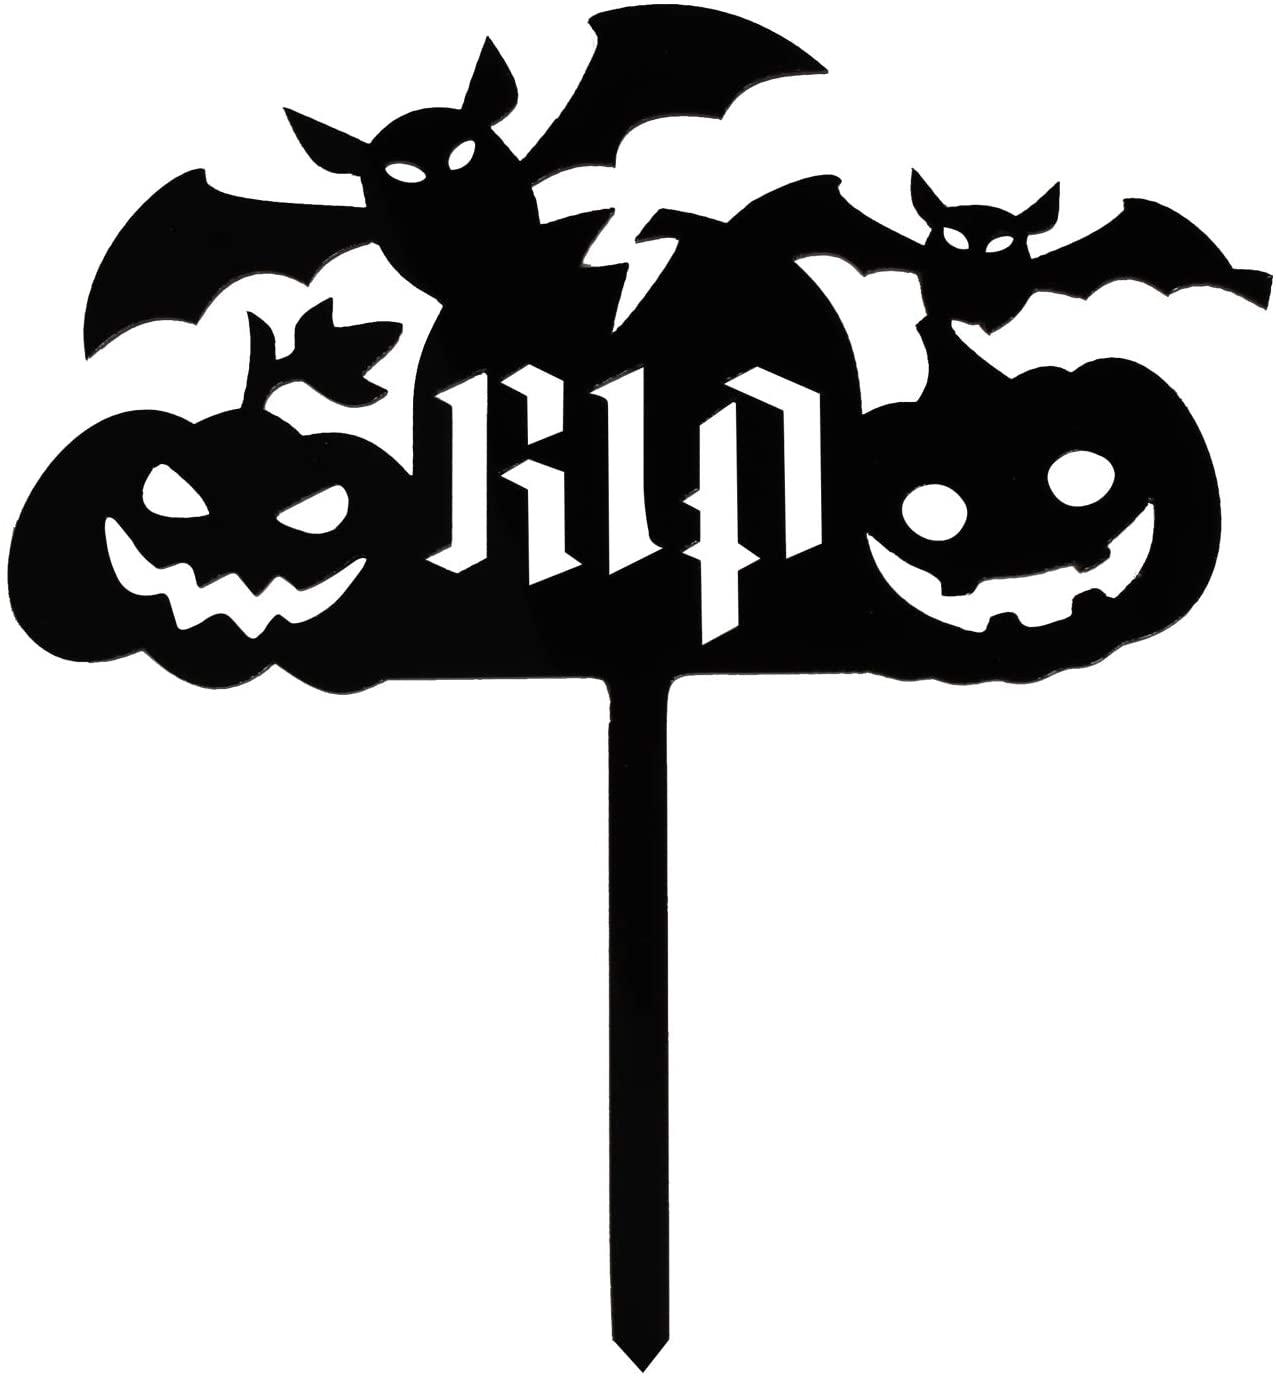 Halloween Cake Top Hat Pumpkin Bat Creative Baking Cake Decoration Funny Party Supplies